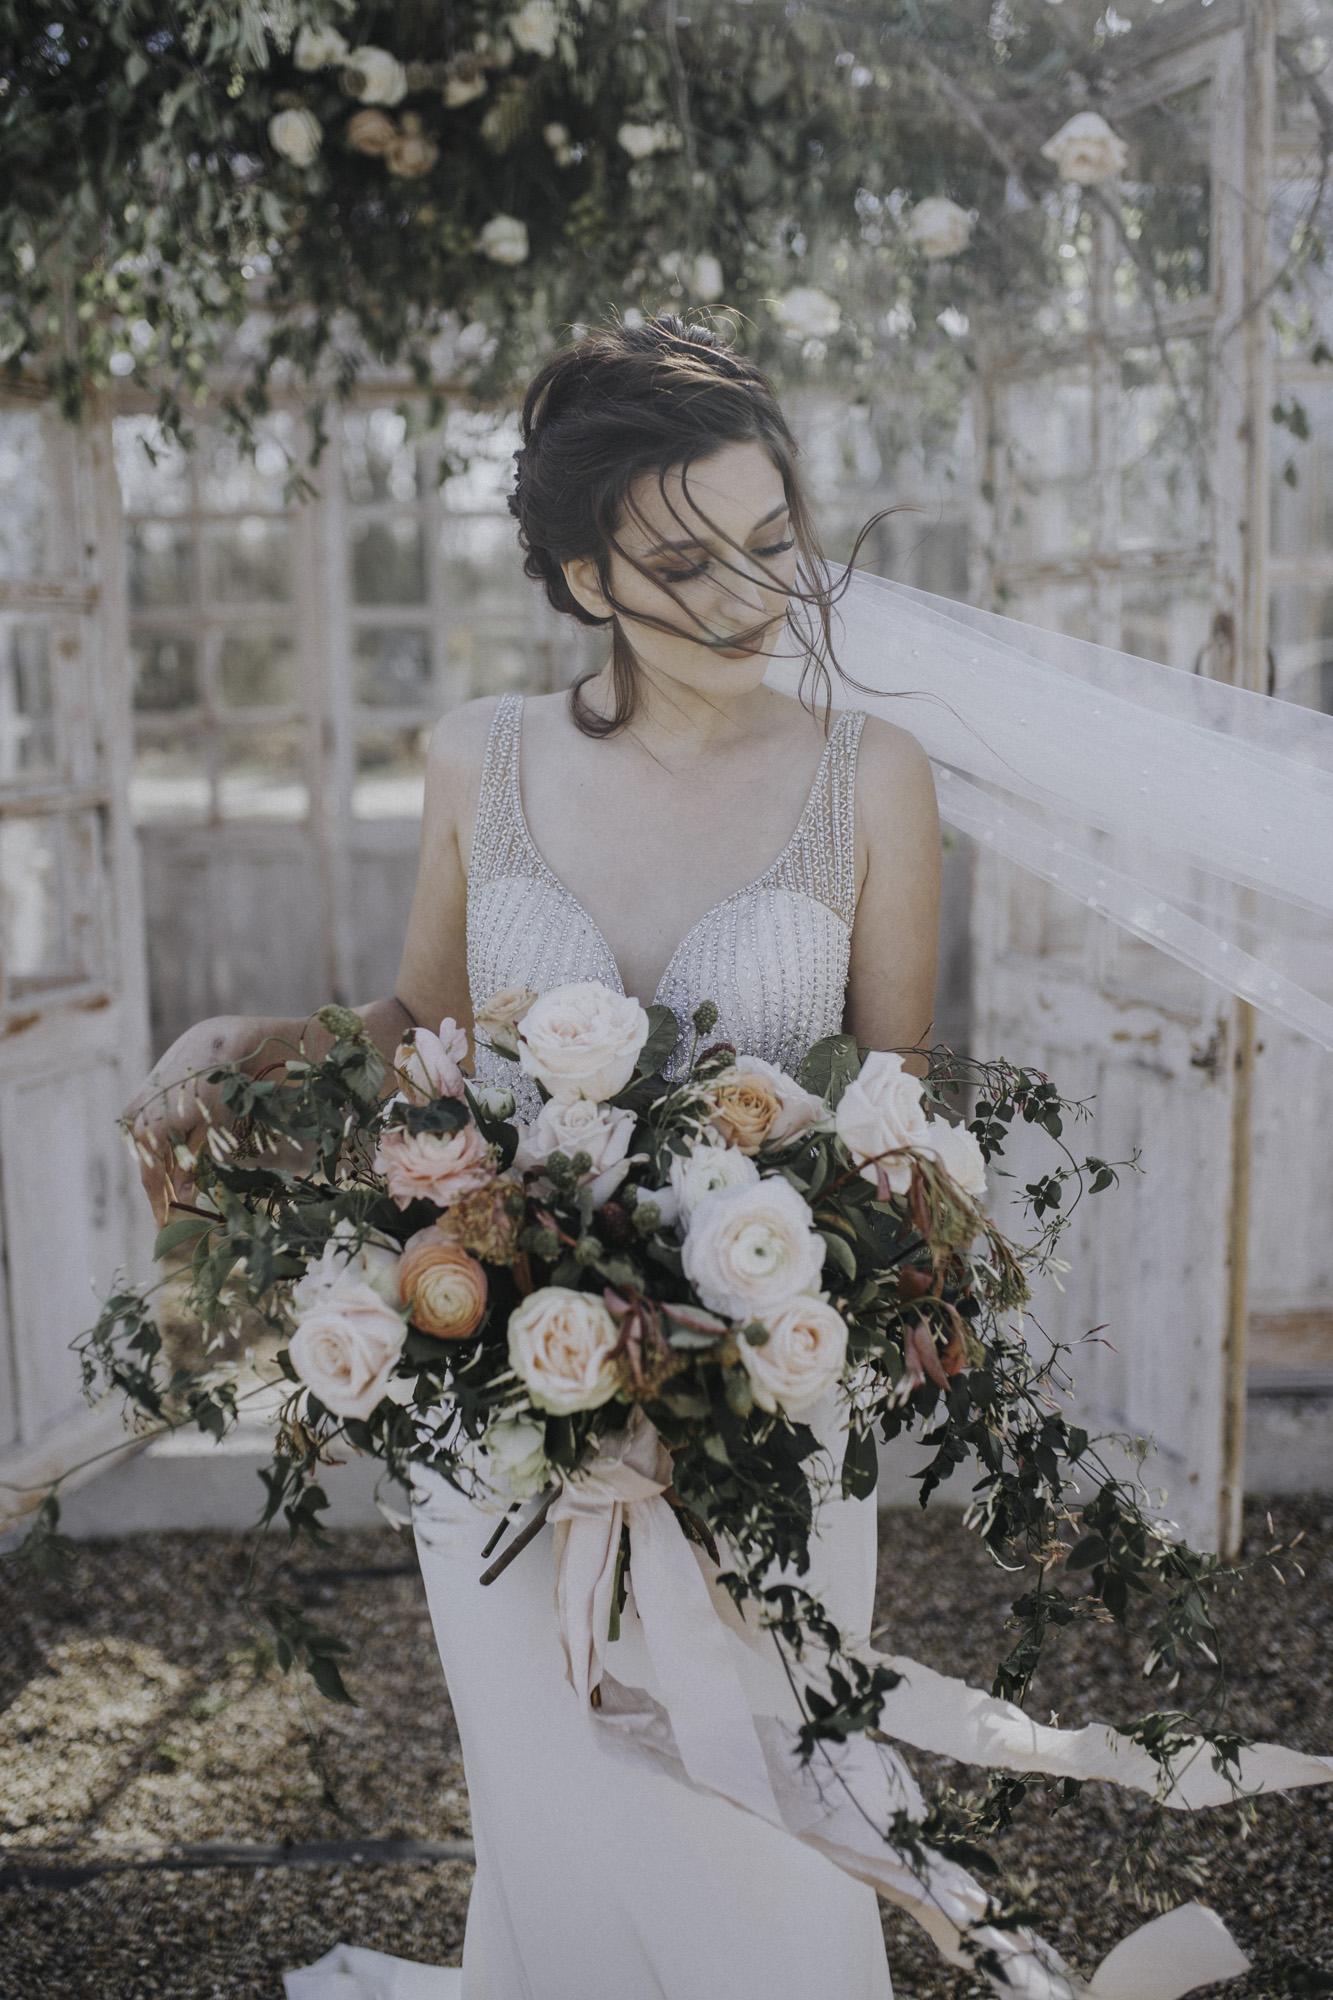 Cate_Ann_Photography_Dayton_Ohio_Wedding_Elopement_And_Engagement_PhotographerIMG_8449.jpg